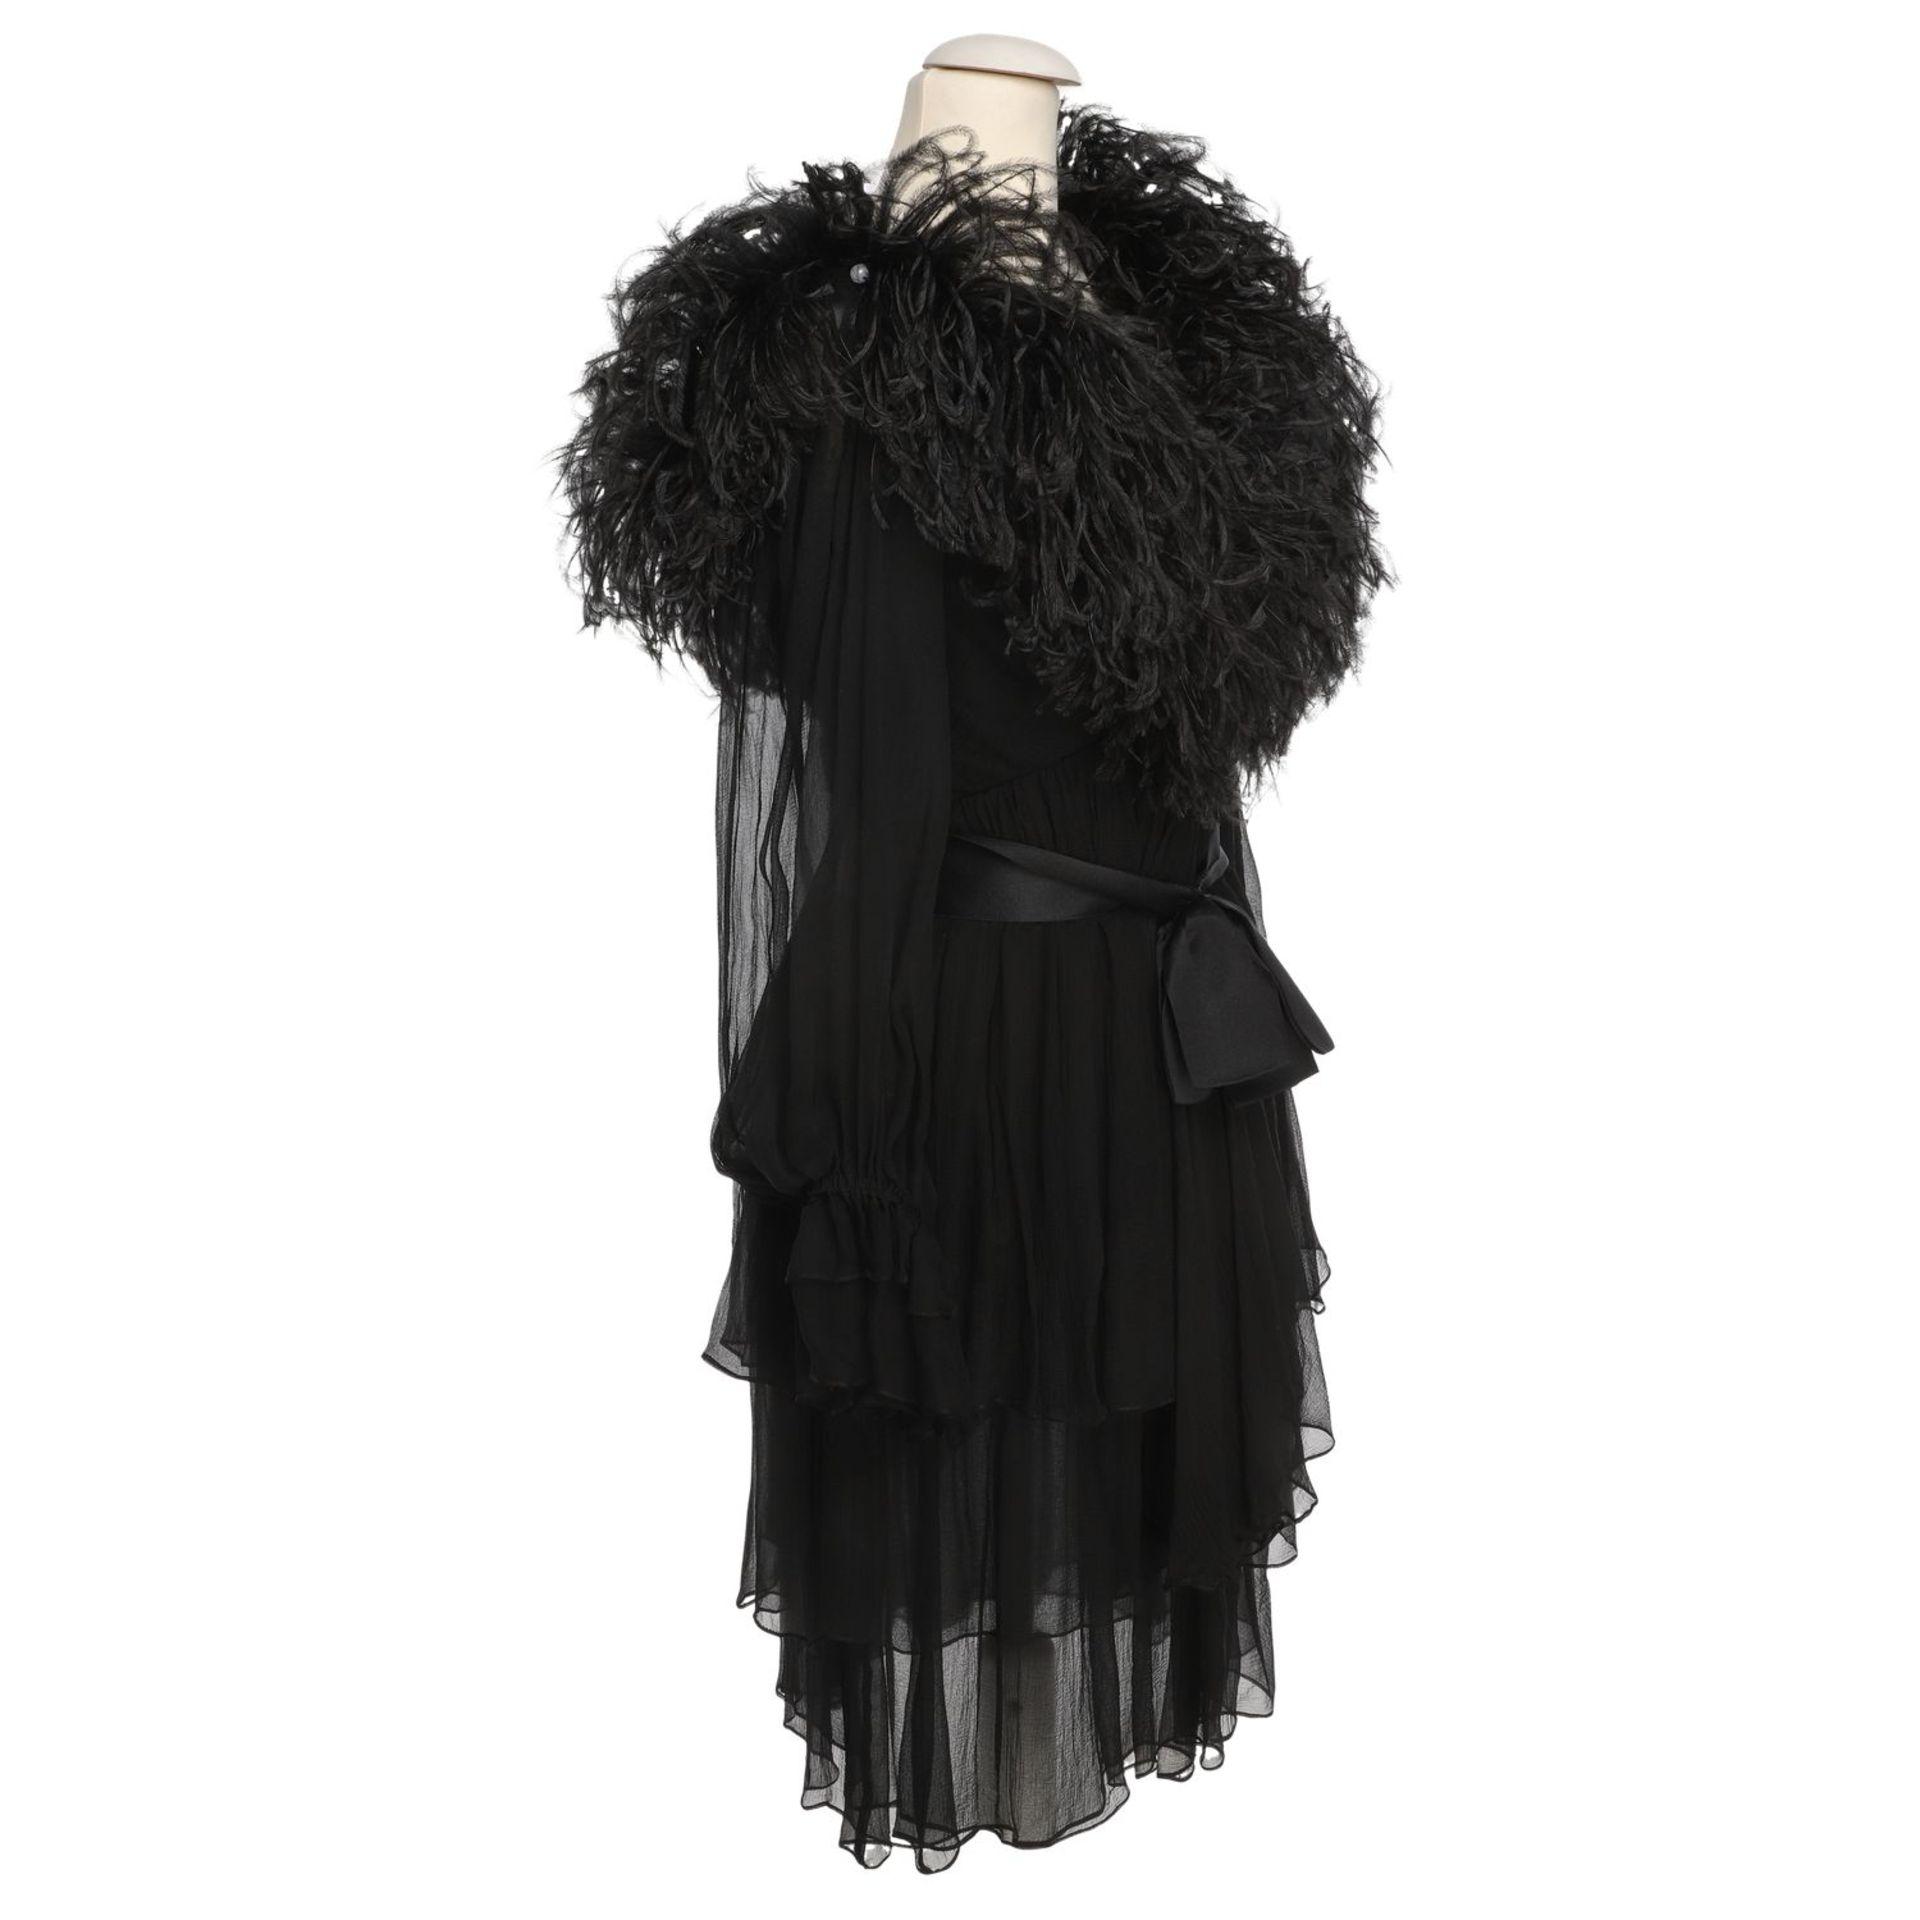 YVES SAINT LAURENT VINTAGE Kleid, Herstellergröße 36. - Image 2 of 4